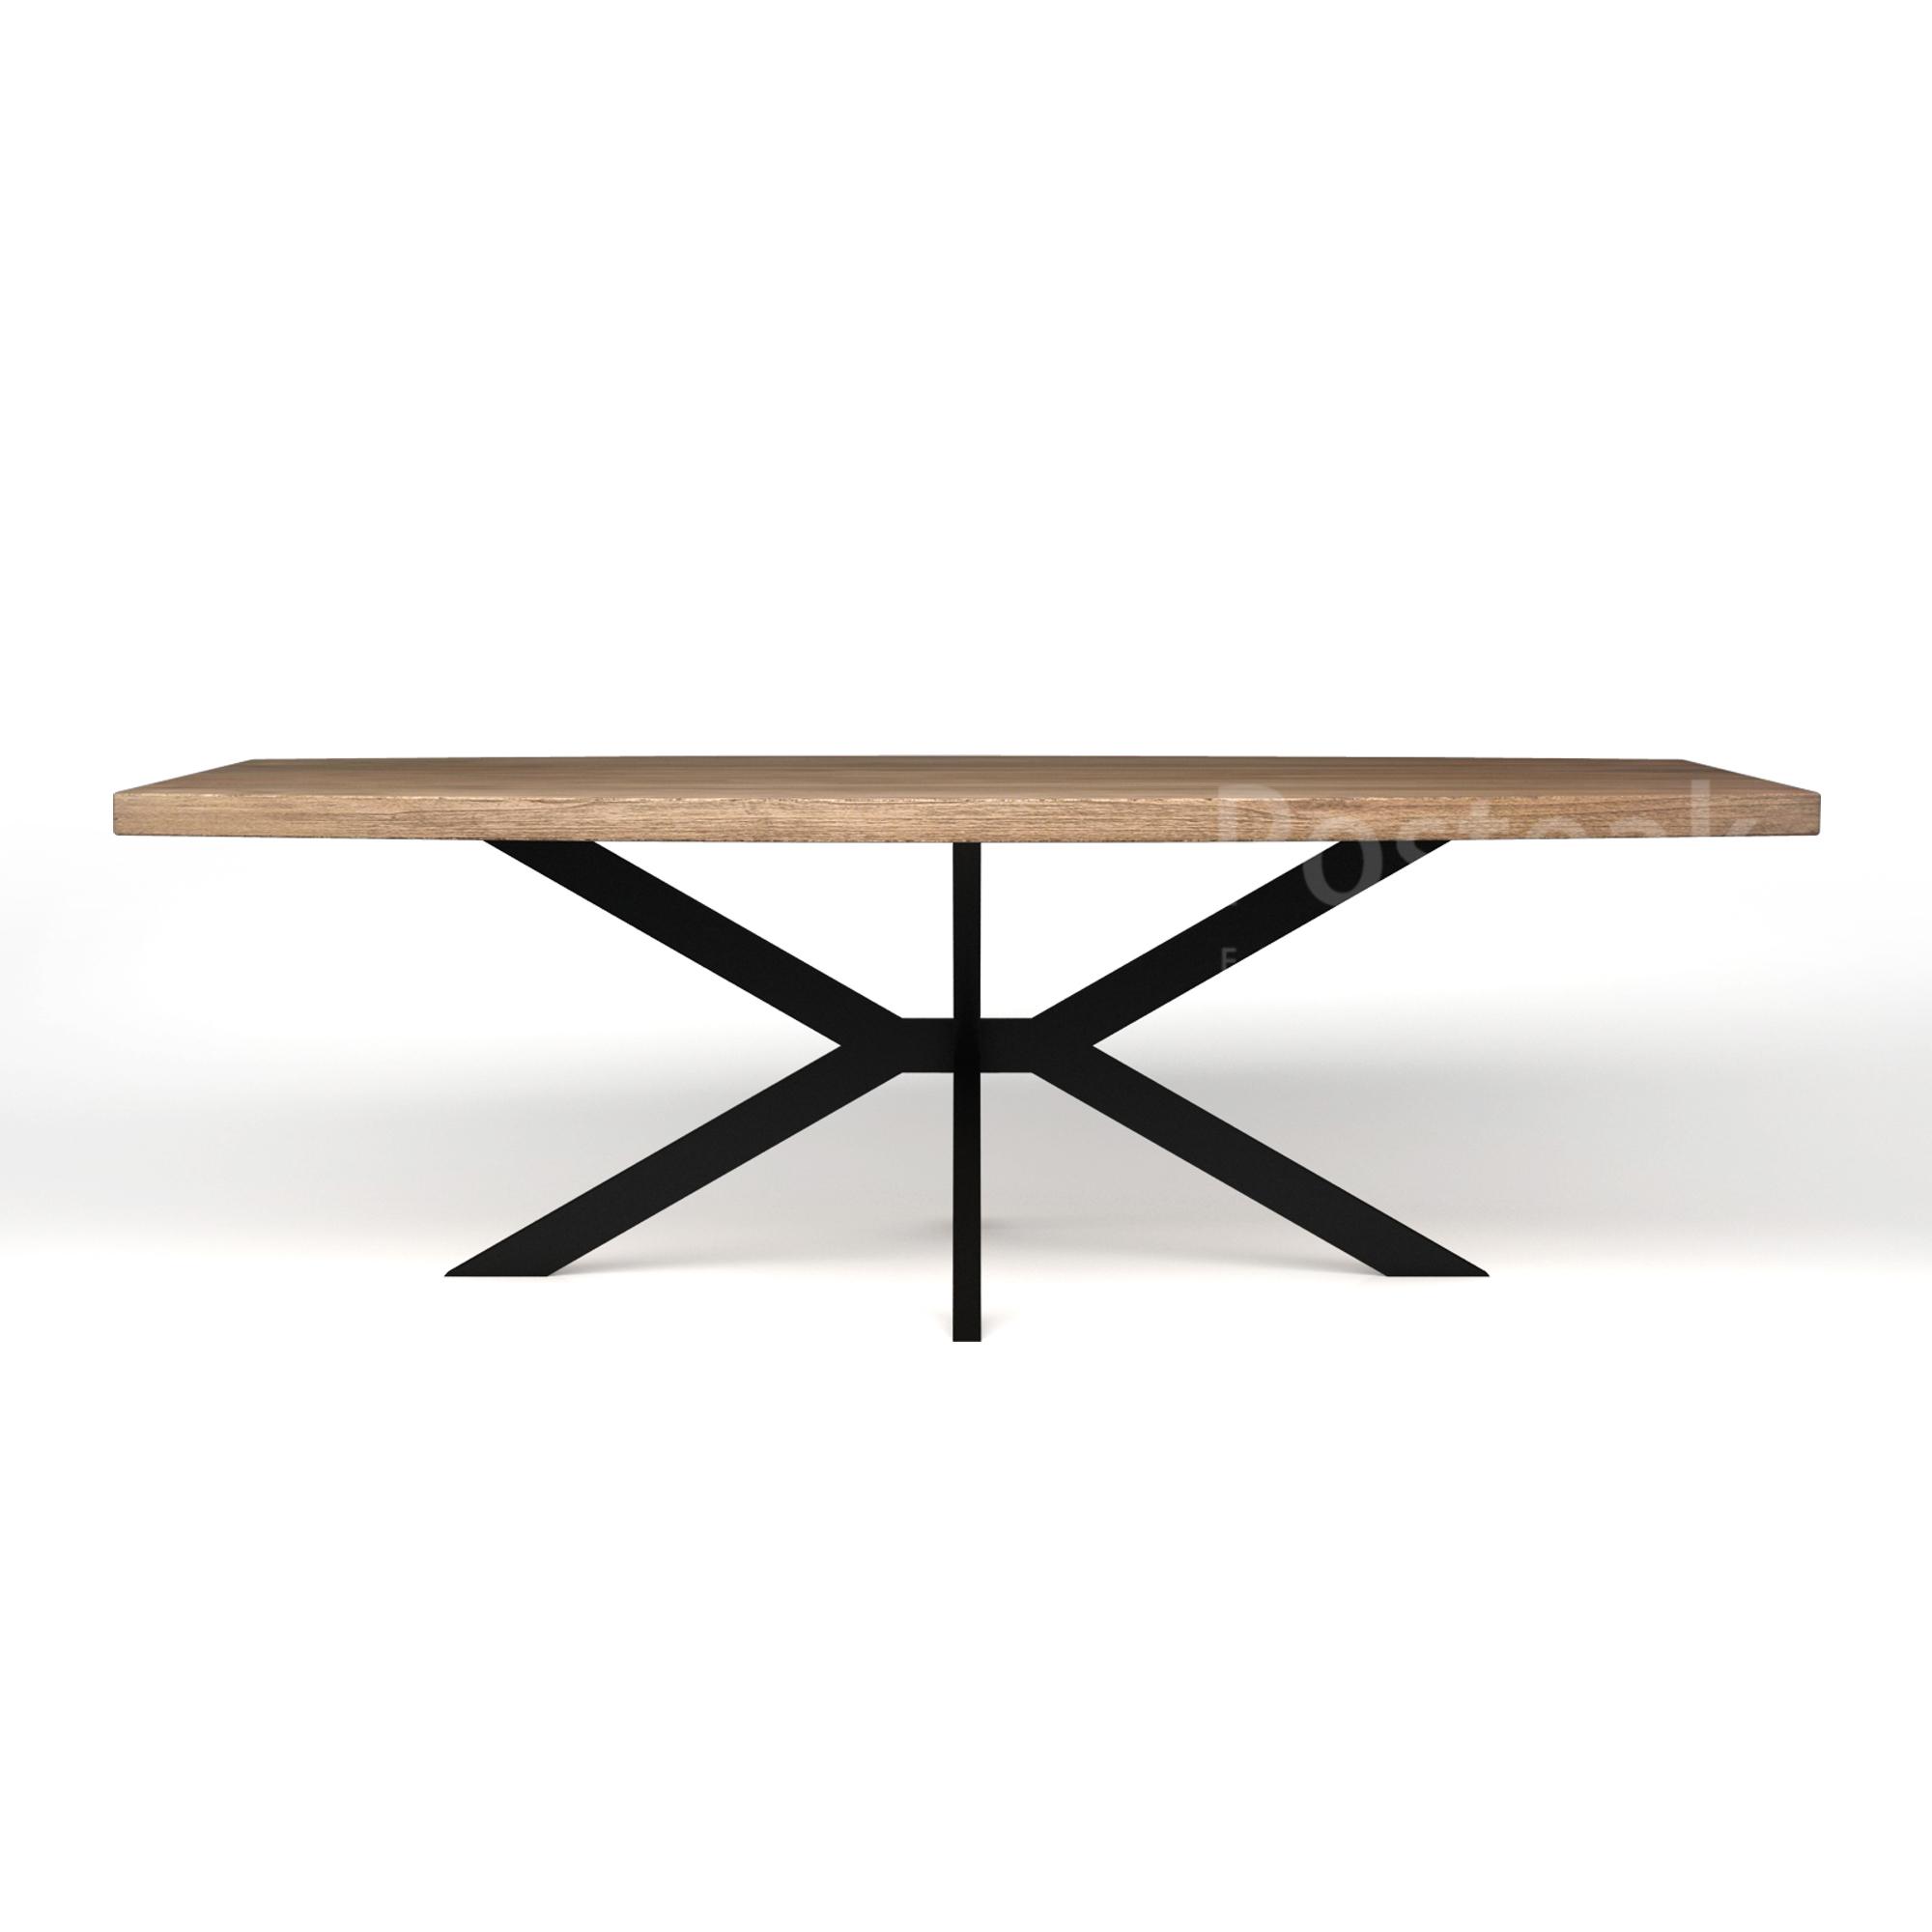 Modern Dining Table Iron Cross Legs Posteak Furniture